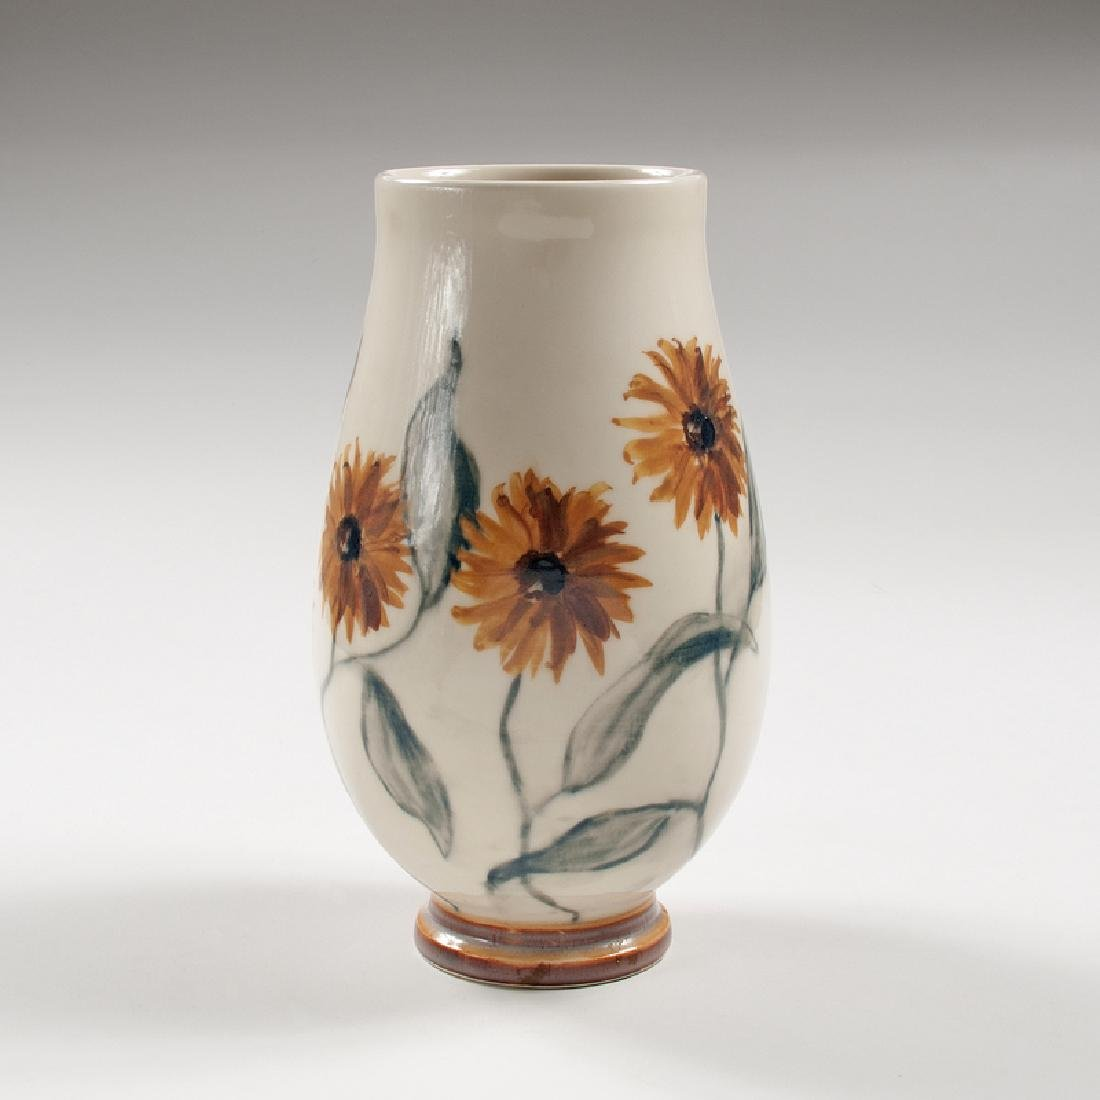 Rookwood Vase by Jens Jensen